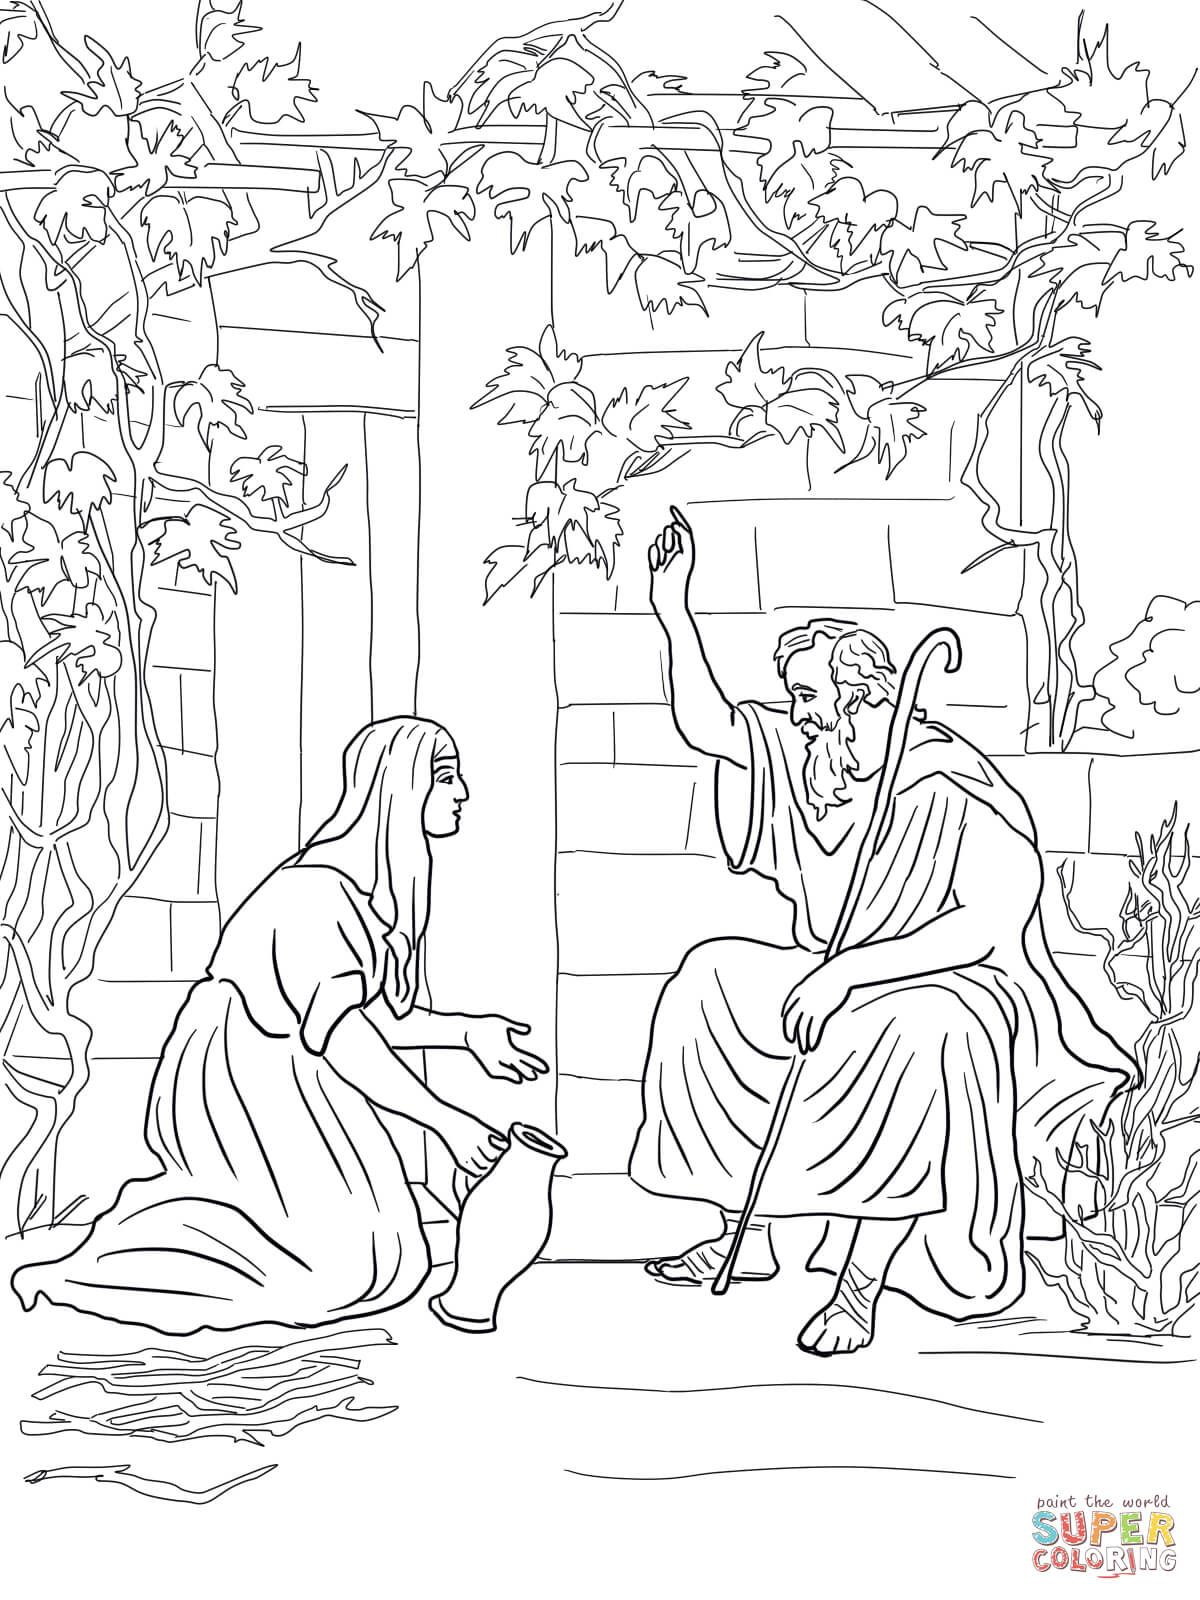 Elijah And The Widow Of Zarephath Elijah And The Widow Bible Coloring Pages Coloring Pages